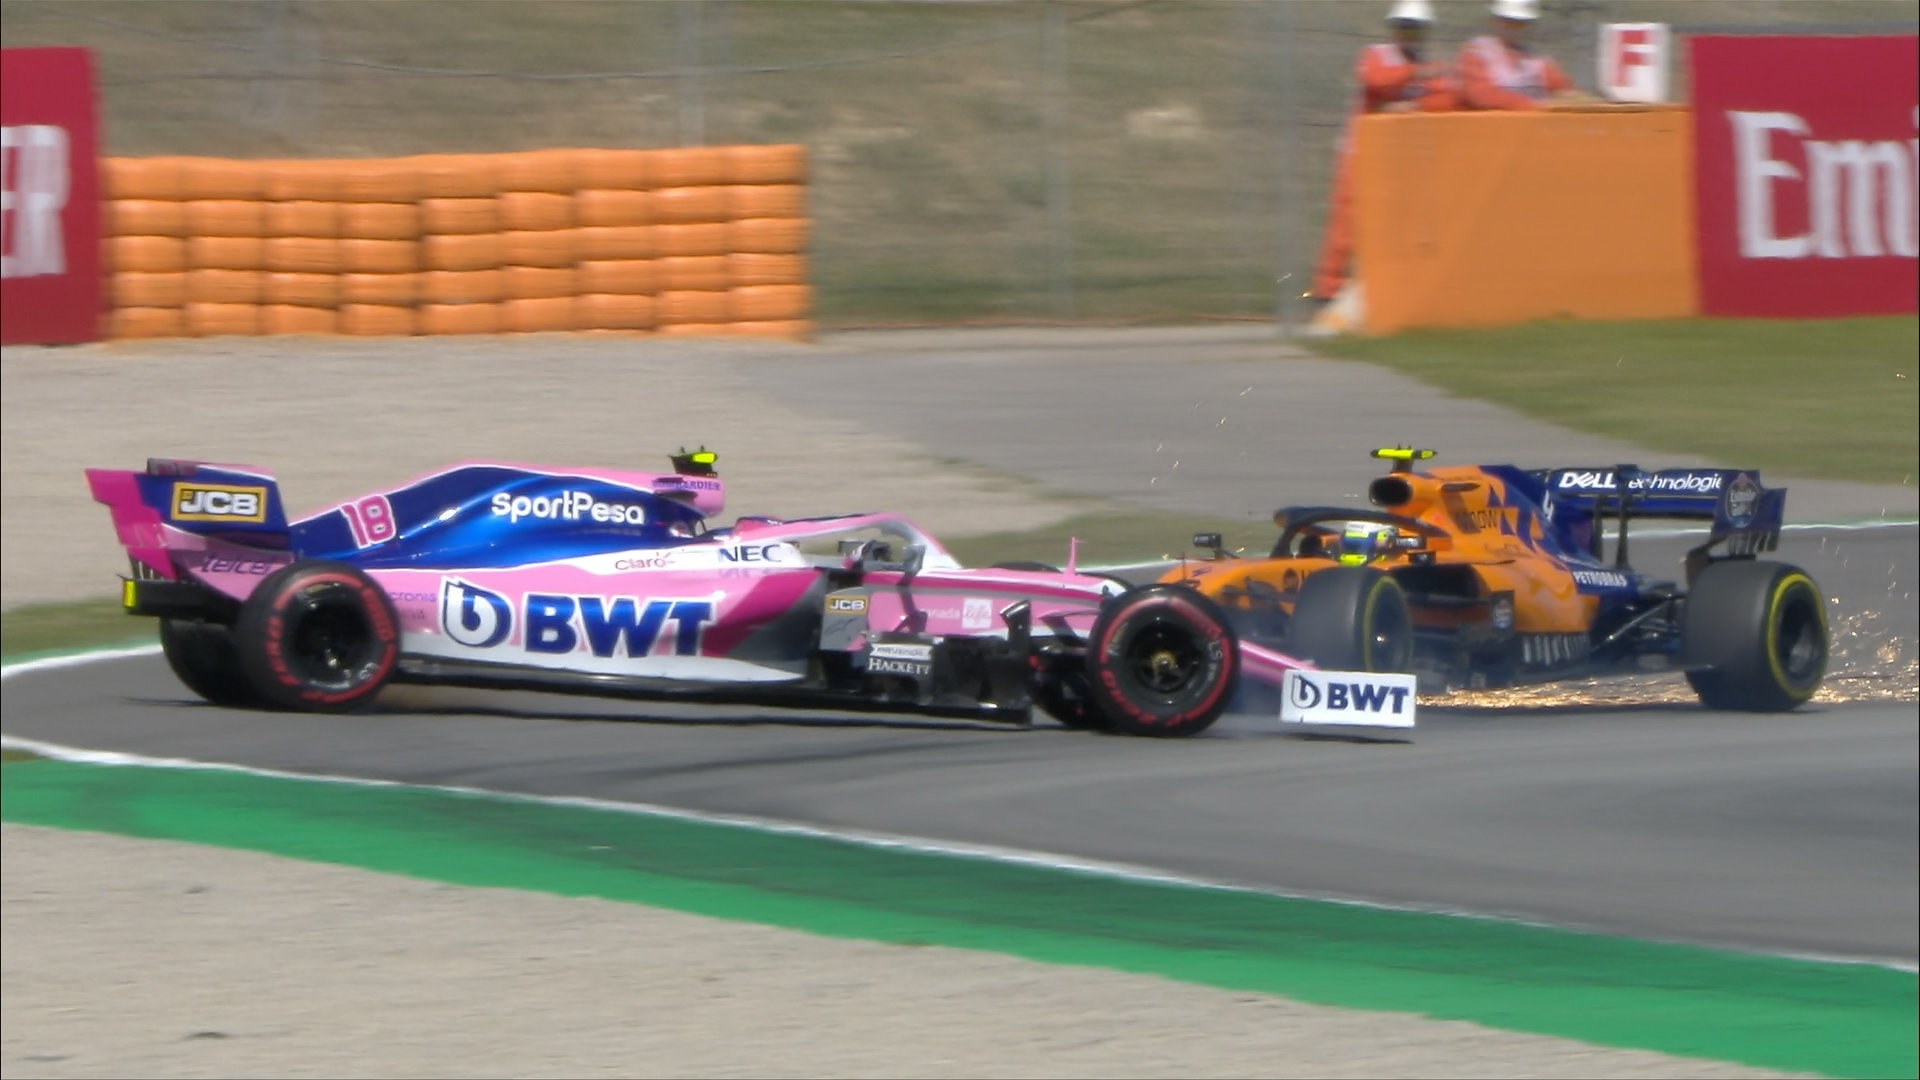 Gp F1 Calendario 2020.Spanish Grand Prix Formula 1 To Race In Barcelona In 2020